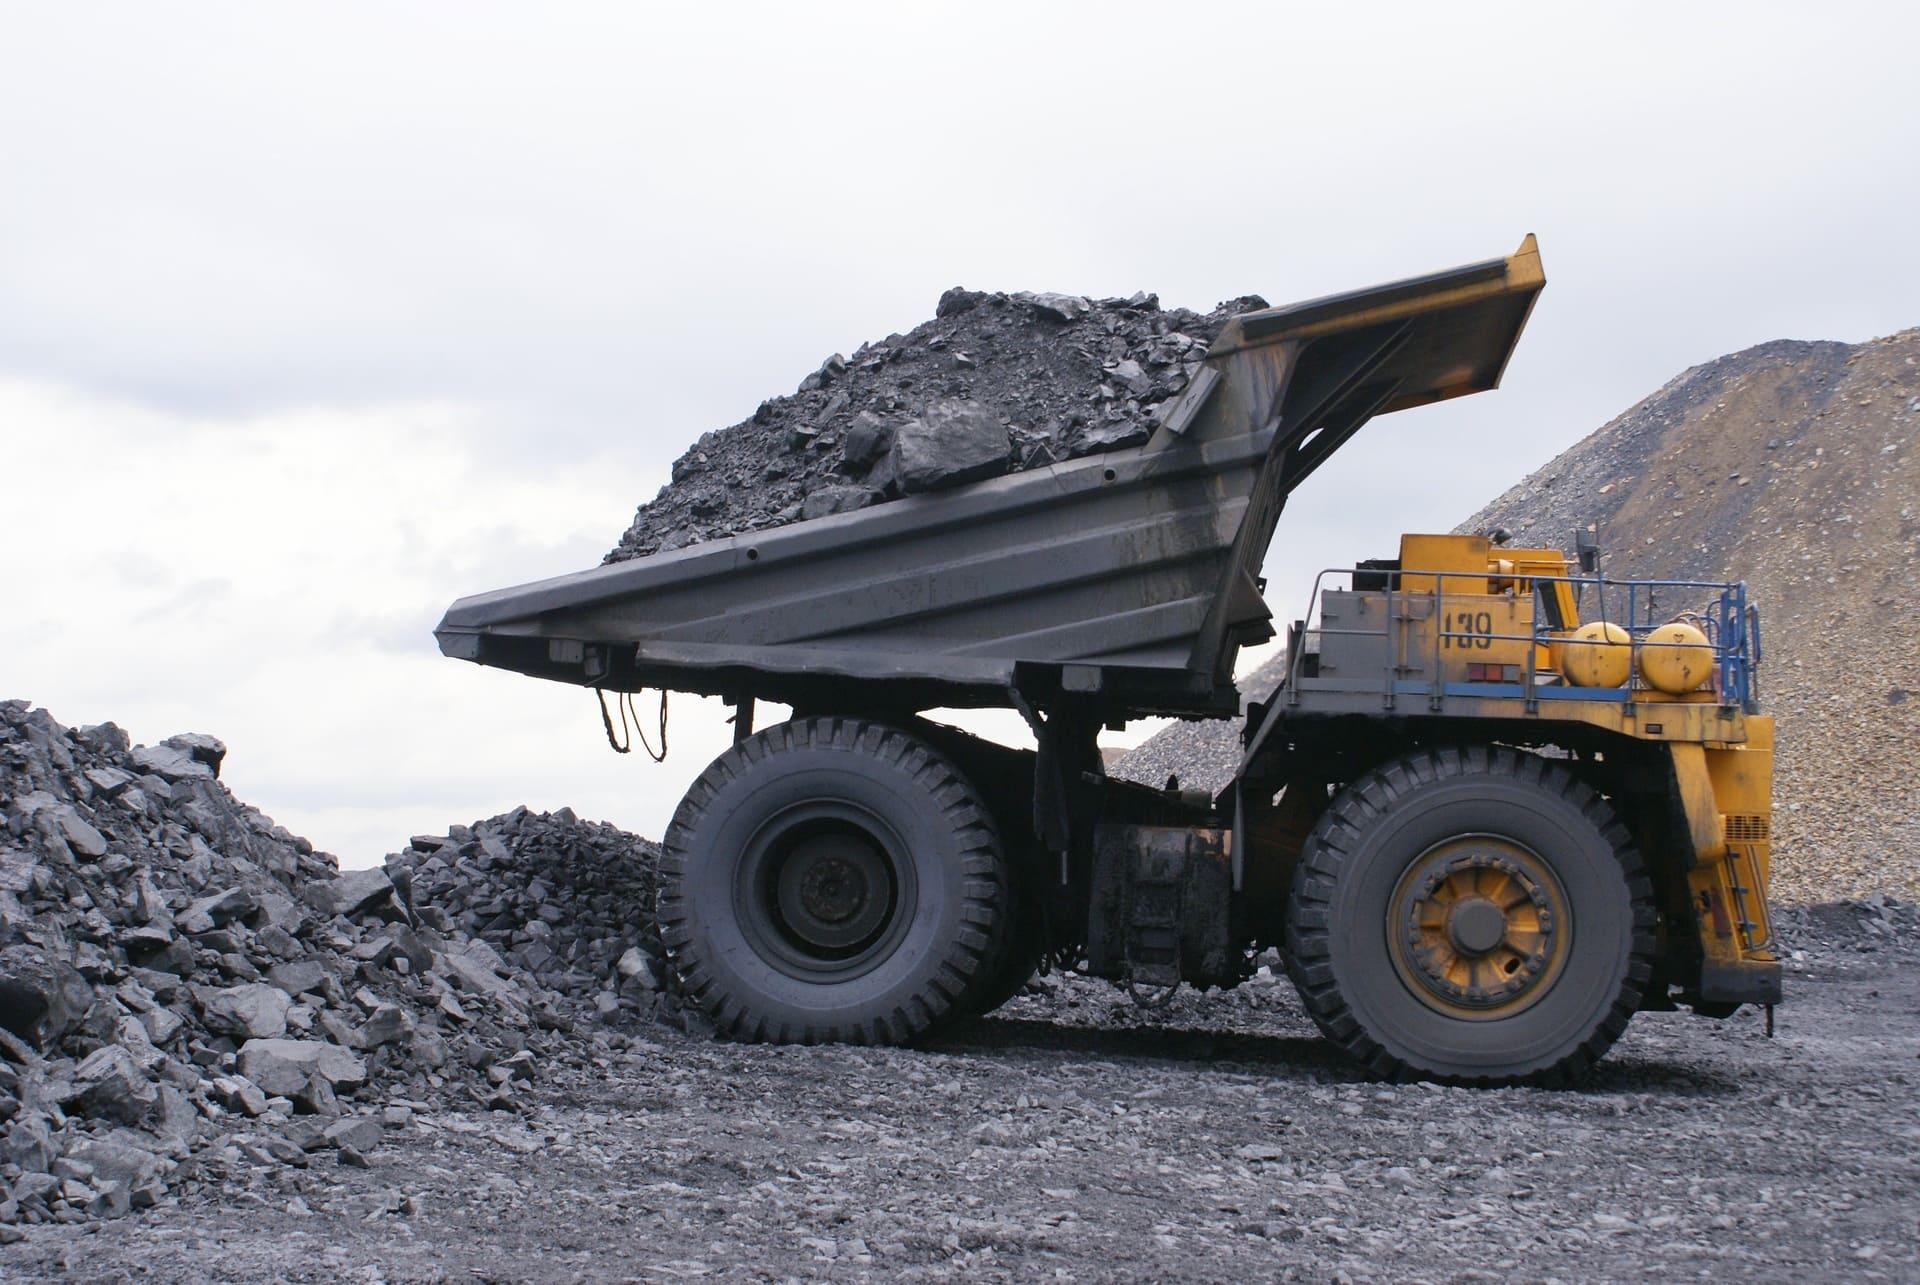 Эксперты «КАДФЕМ Си-Ай-Эс» представят сценарии работы цифрового двойника на Mining World Russia 2020